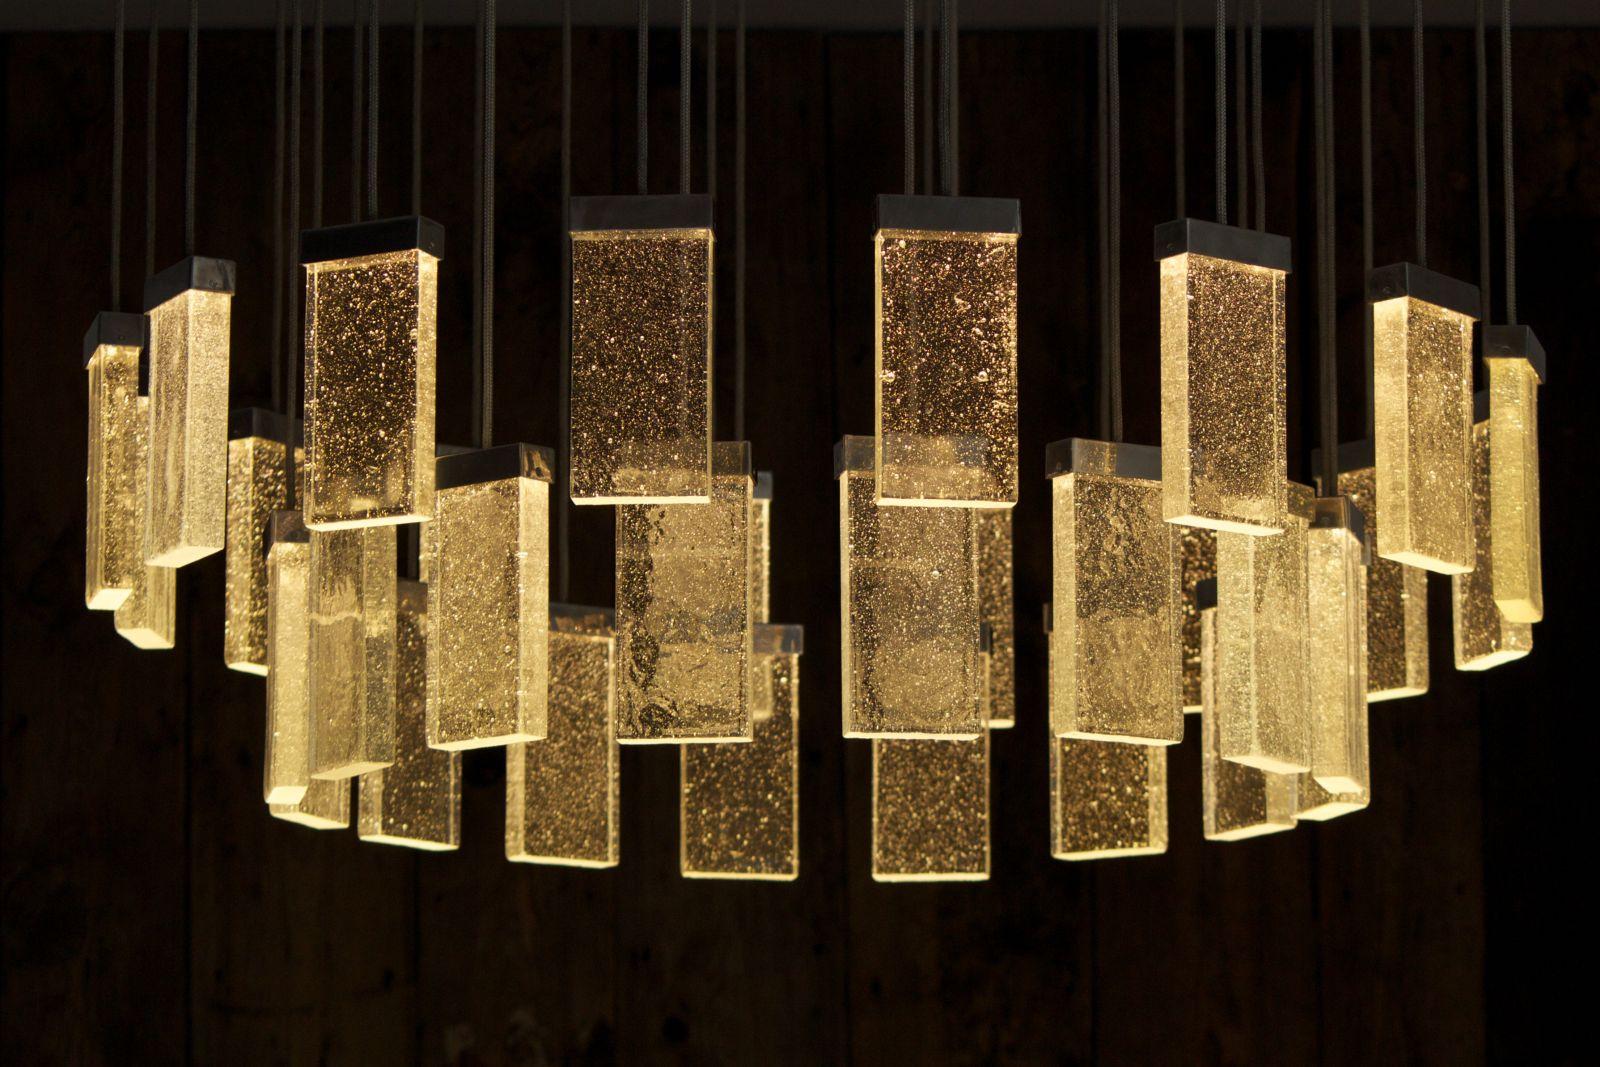 Lmpara araa moderna de vidrio de aluminio led 32 grand cru lmpara araa moderna de vidrio de aluminio led aloadofball Images